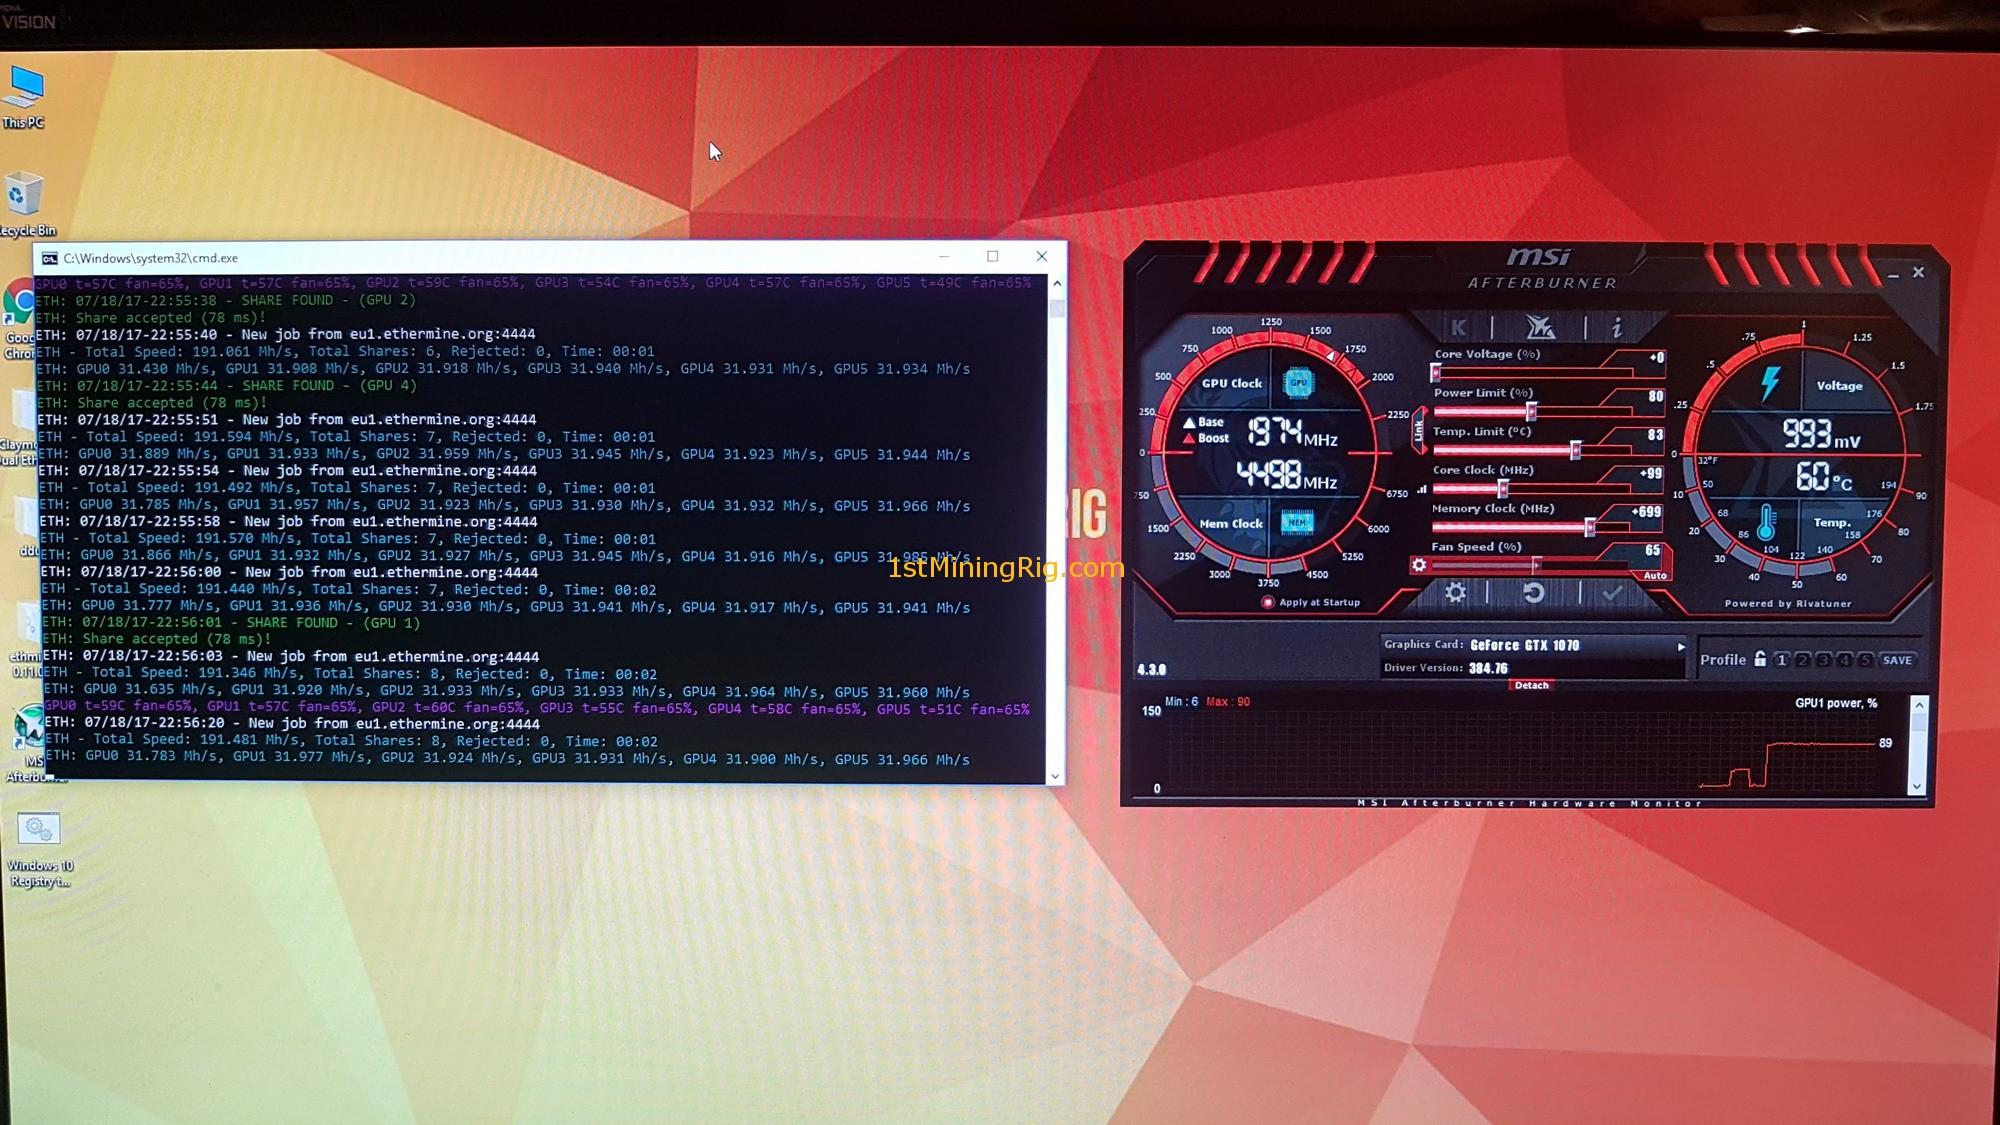 12x ZOTAC GTX 1080 AMP! Extreme Mining System + GPU tweaks